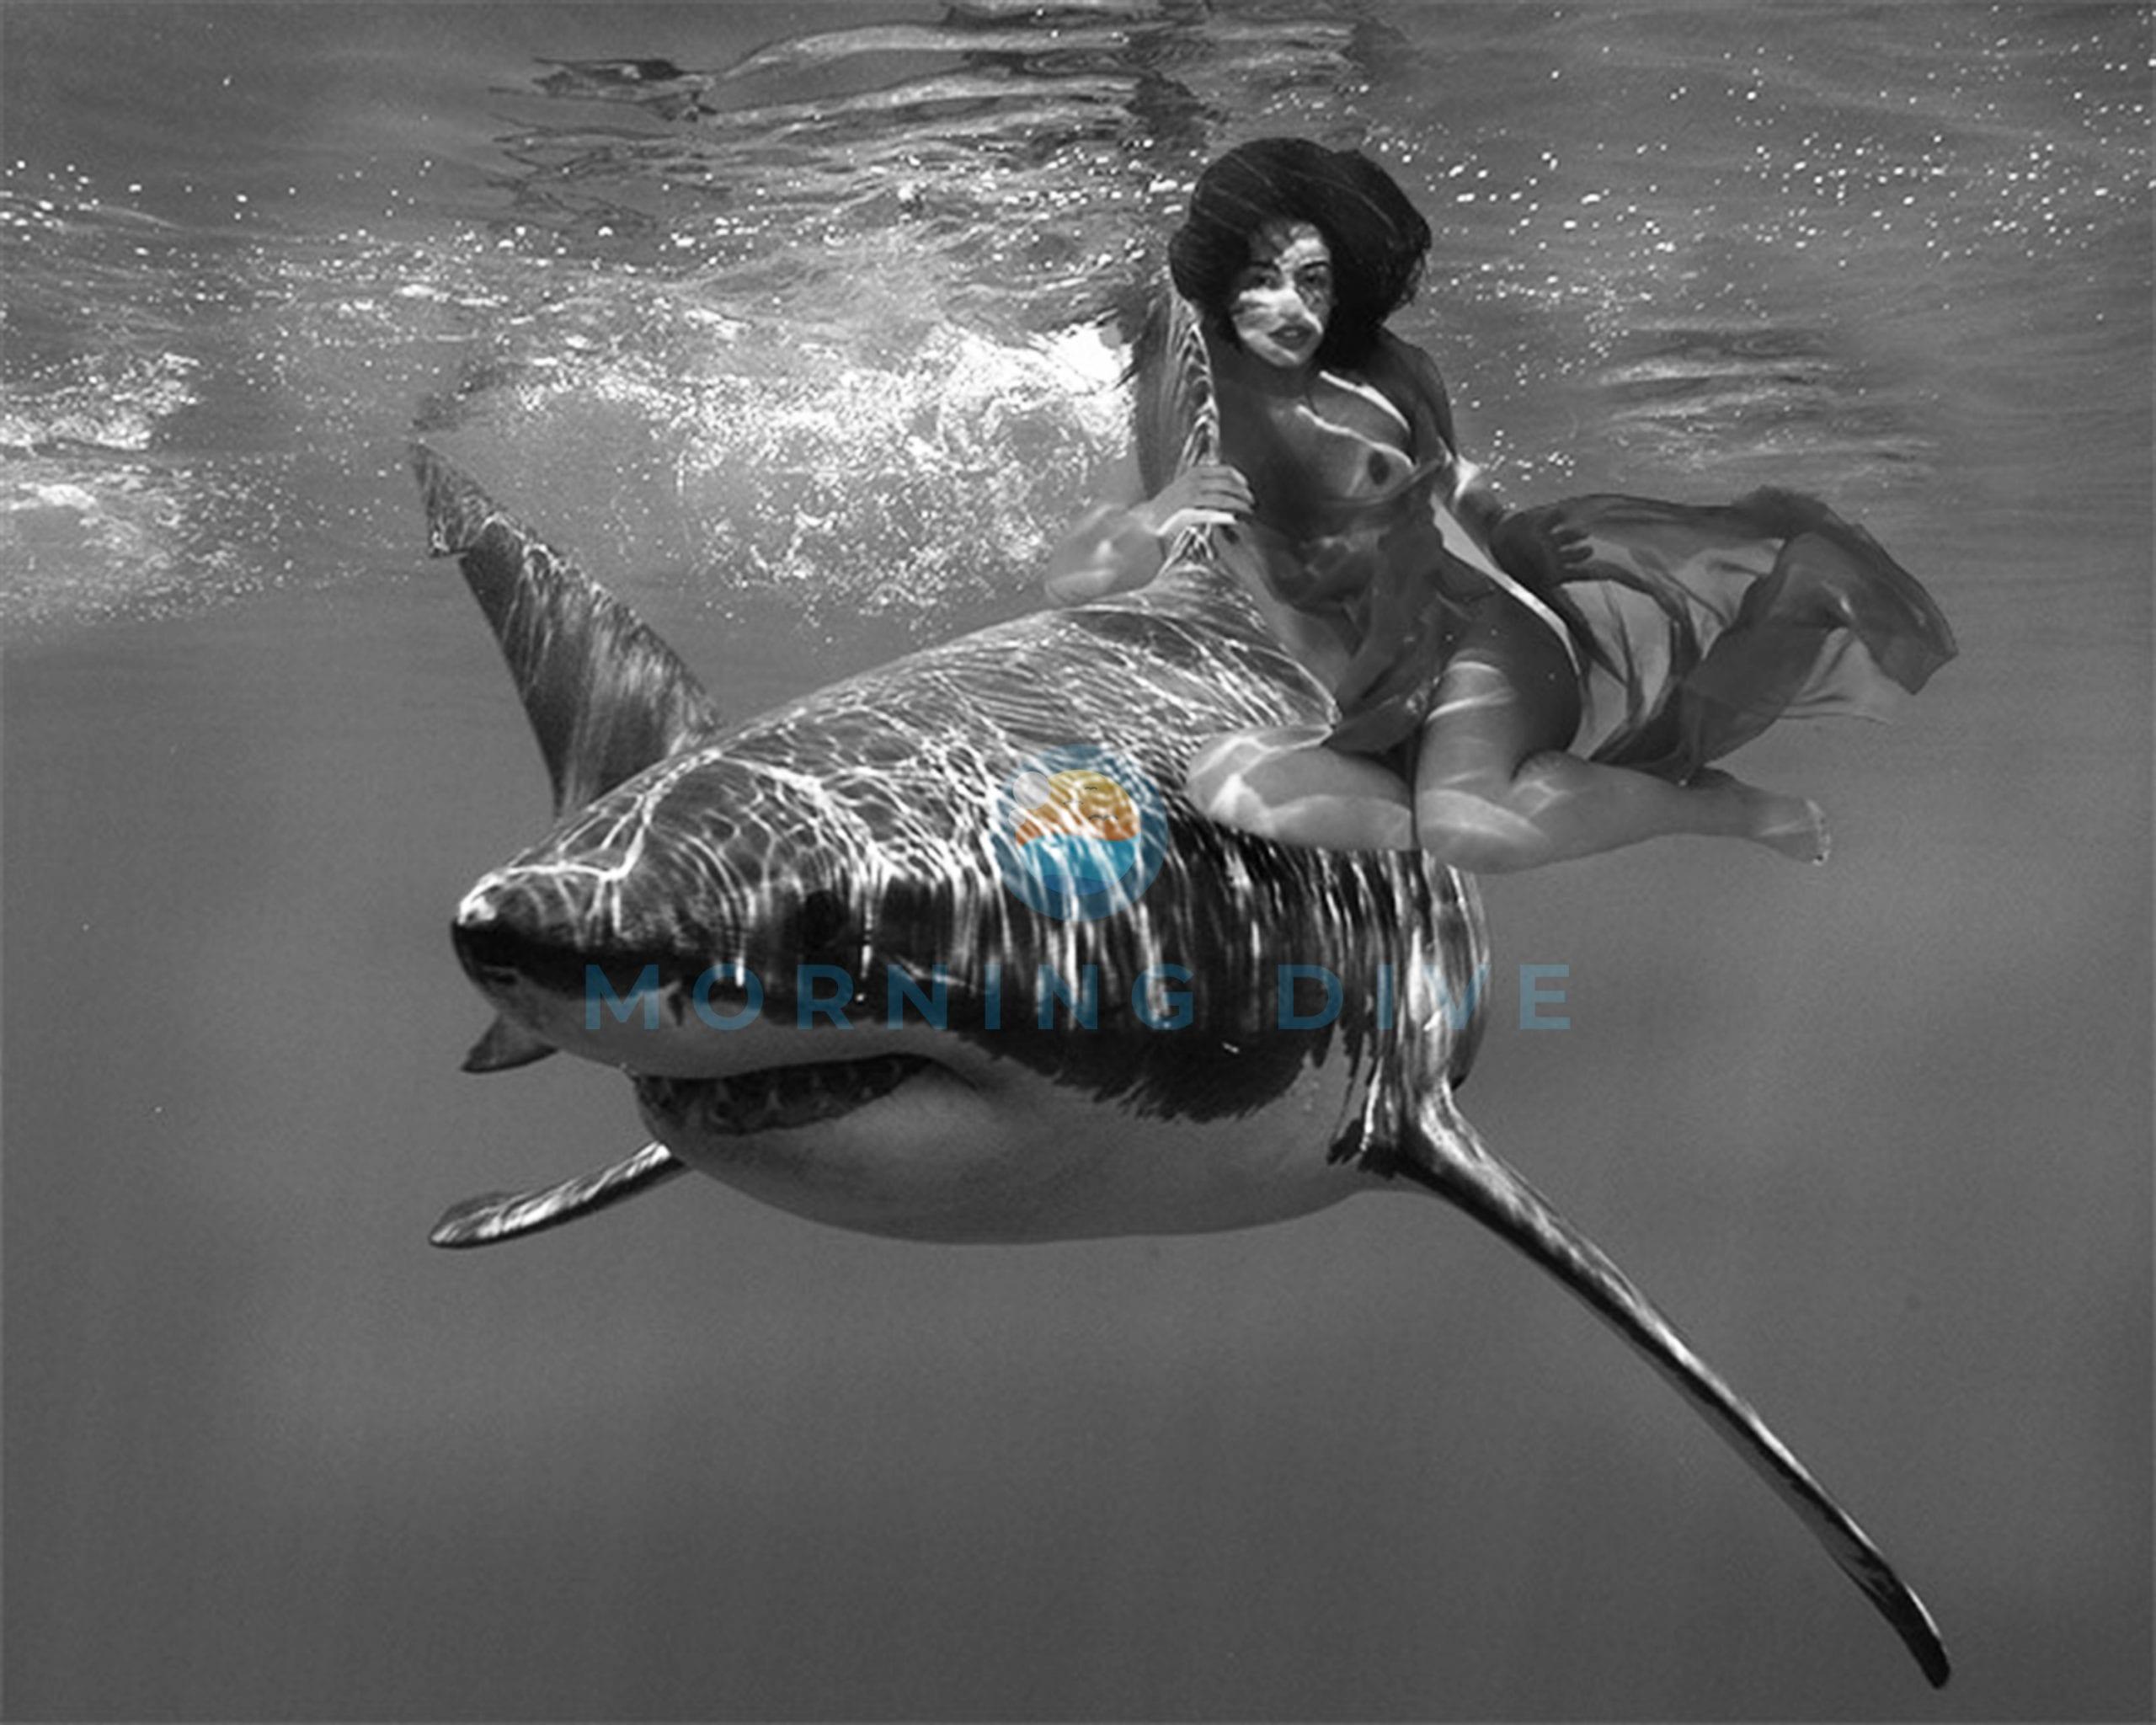 underwater photography shark with women